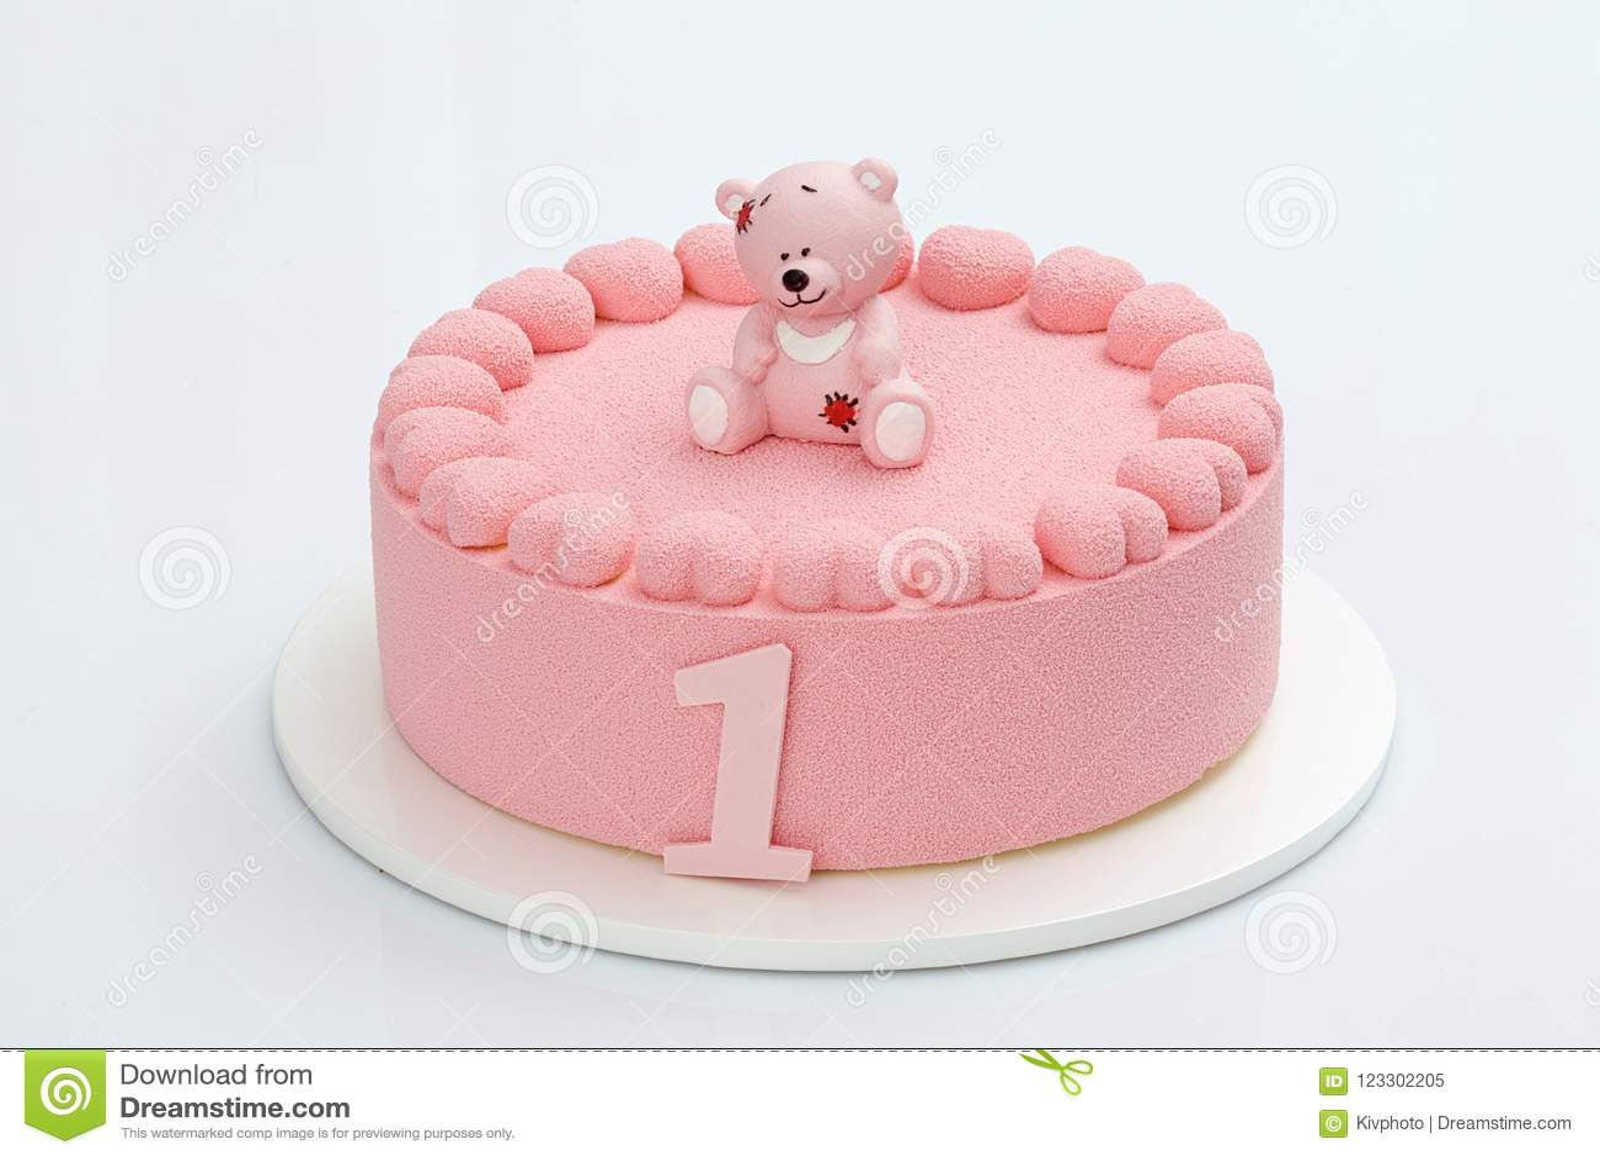 Pleasant Birthday Cake One Year Old Stock Image Image Of Birthday Pink Funny Birthday Cards Online Inifodamsfinfo